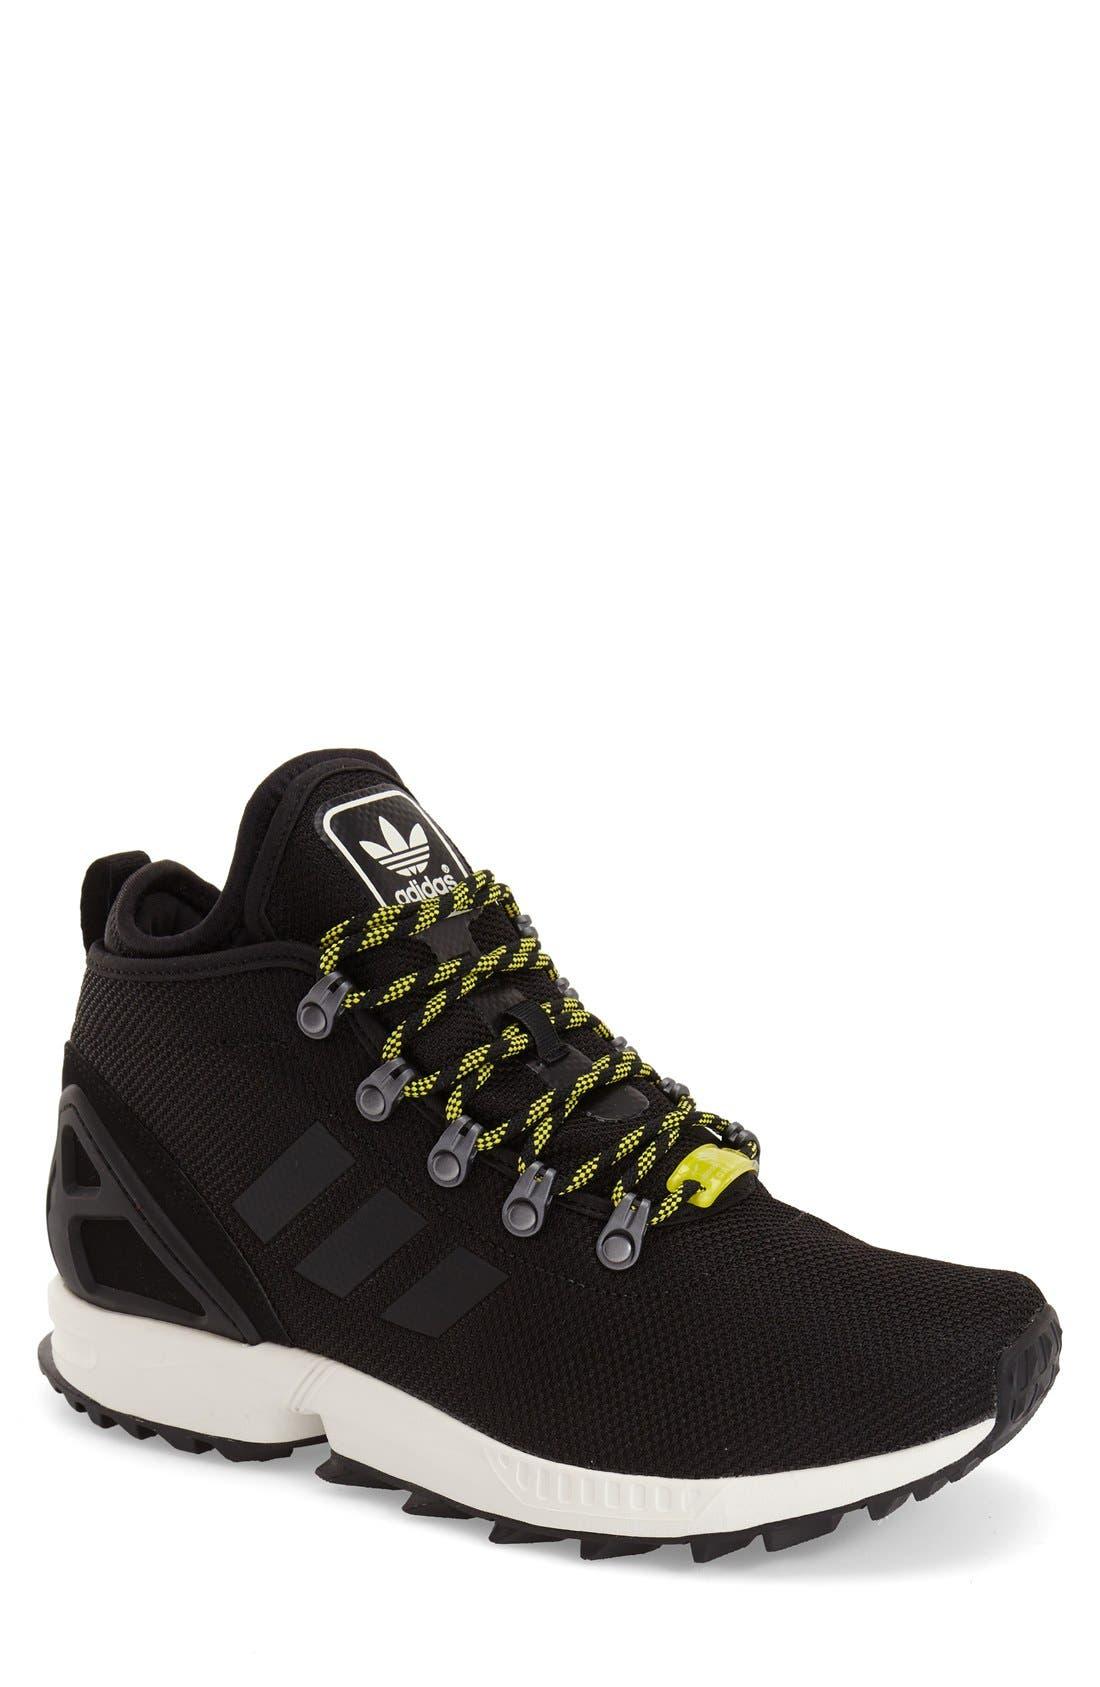 adidas zx flux winter